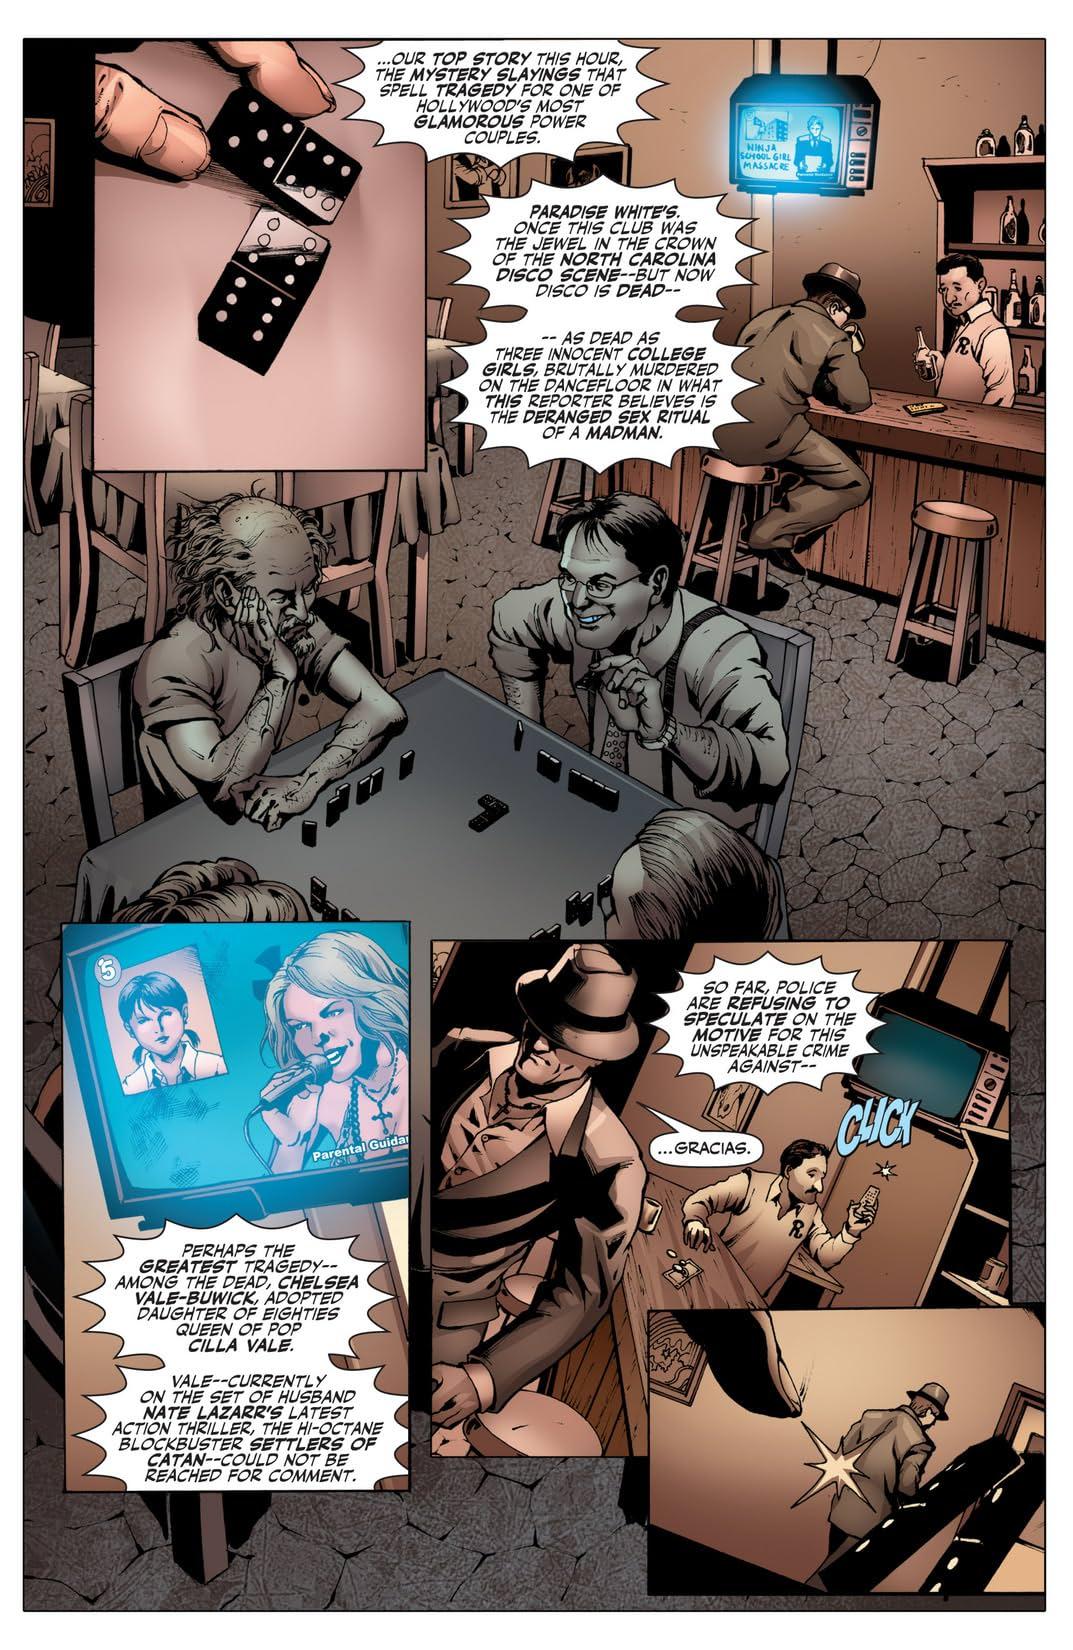 Garth Ennis' Ninjettes #6